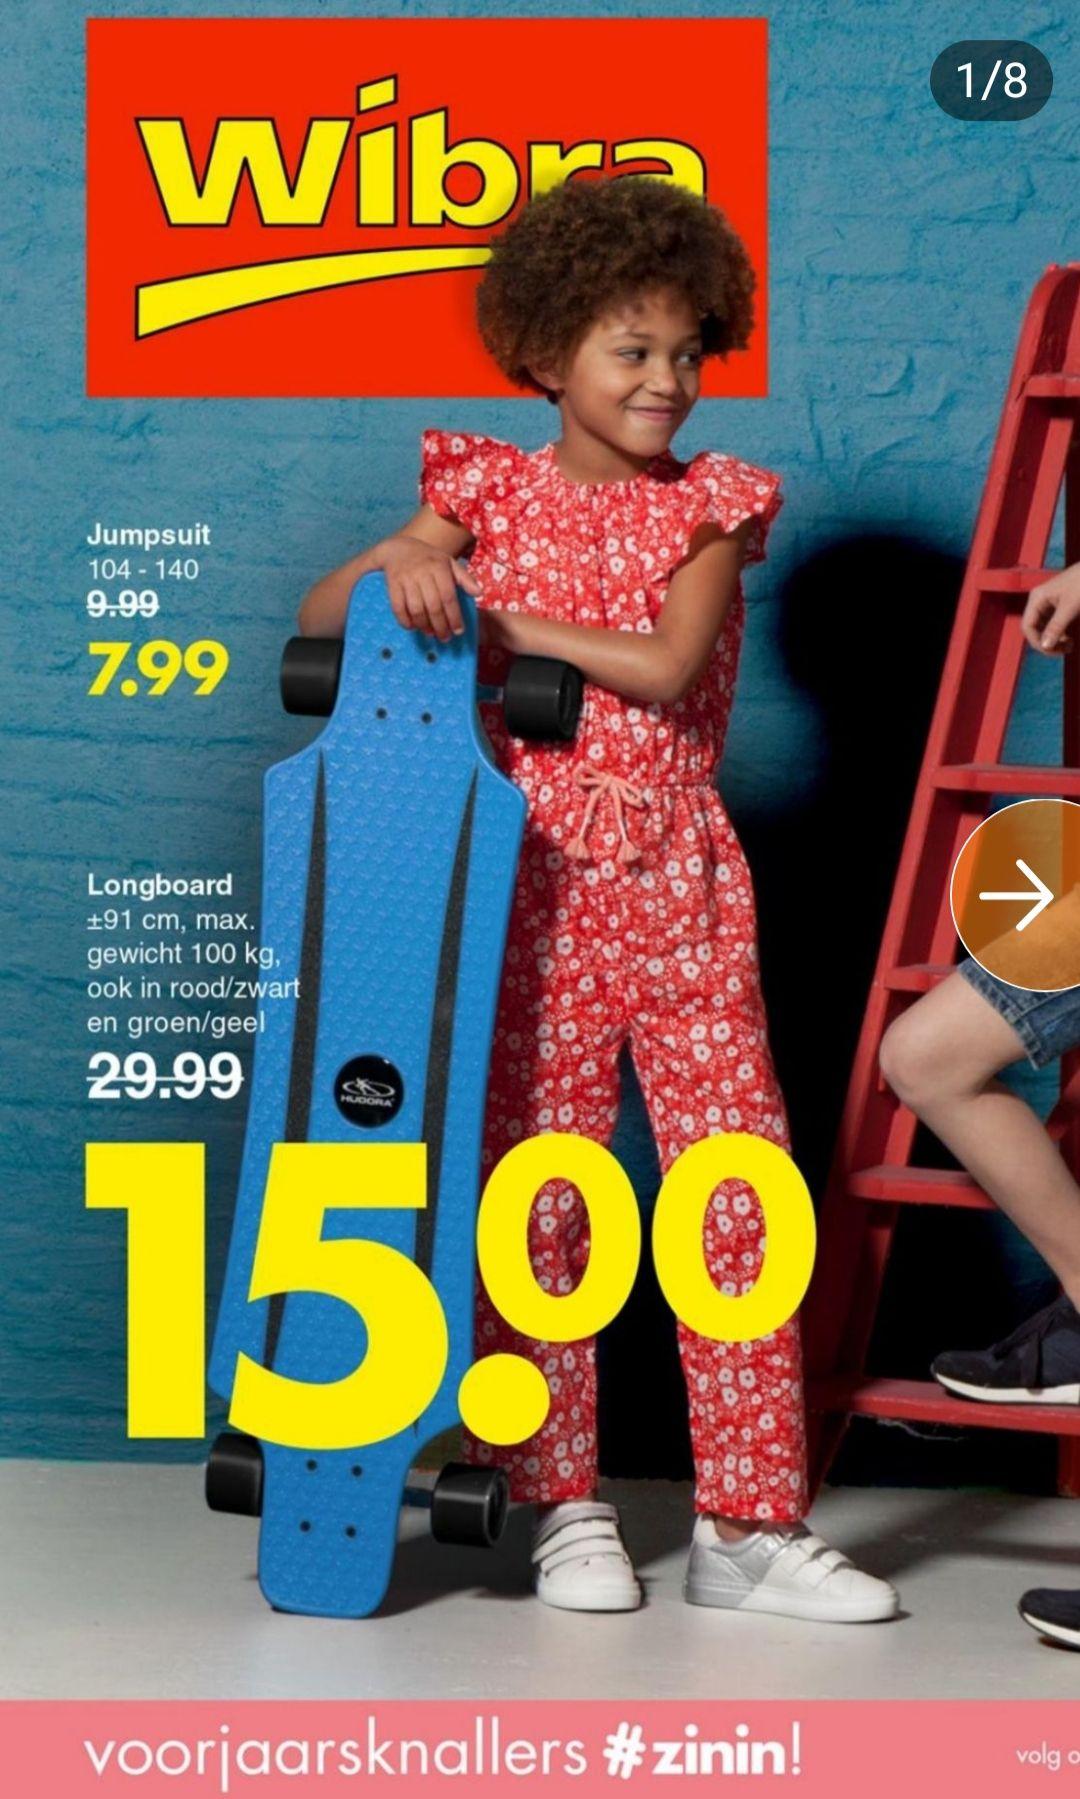 Hudora Fun Cruiser longboard voor 15 euro bij Wibra